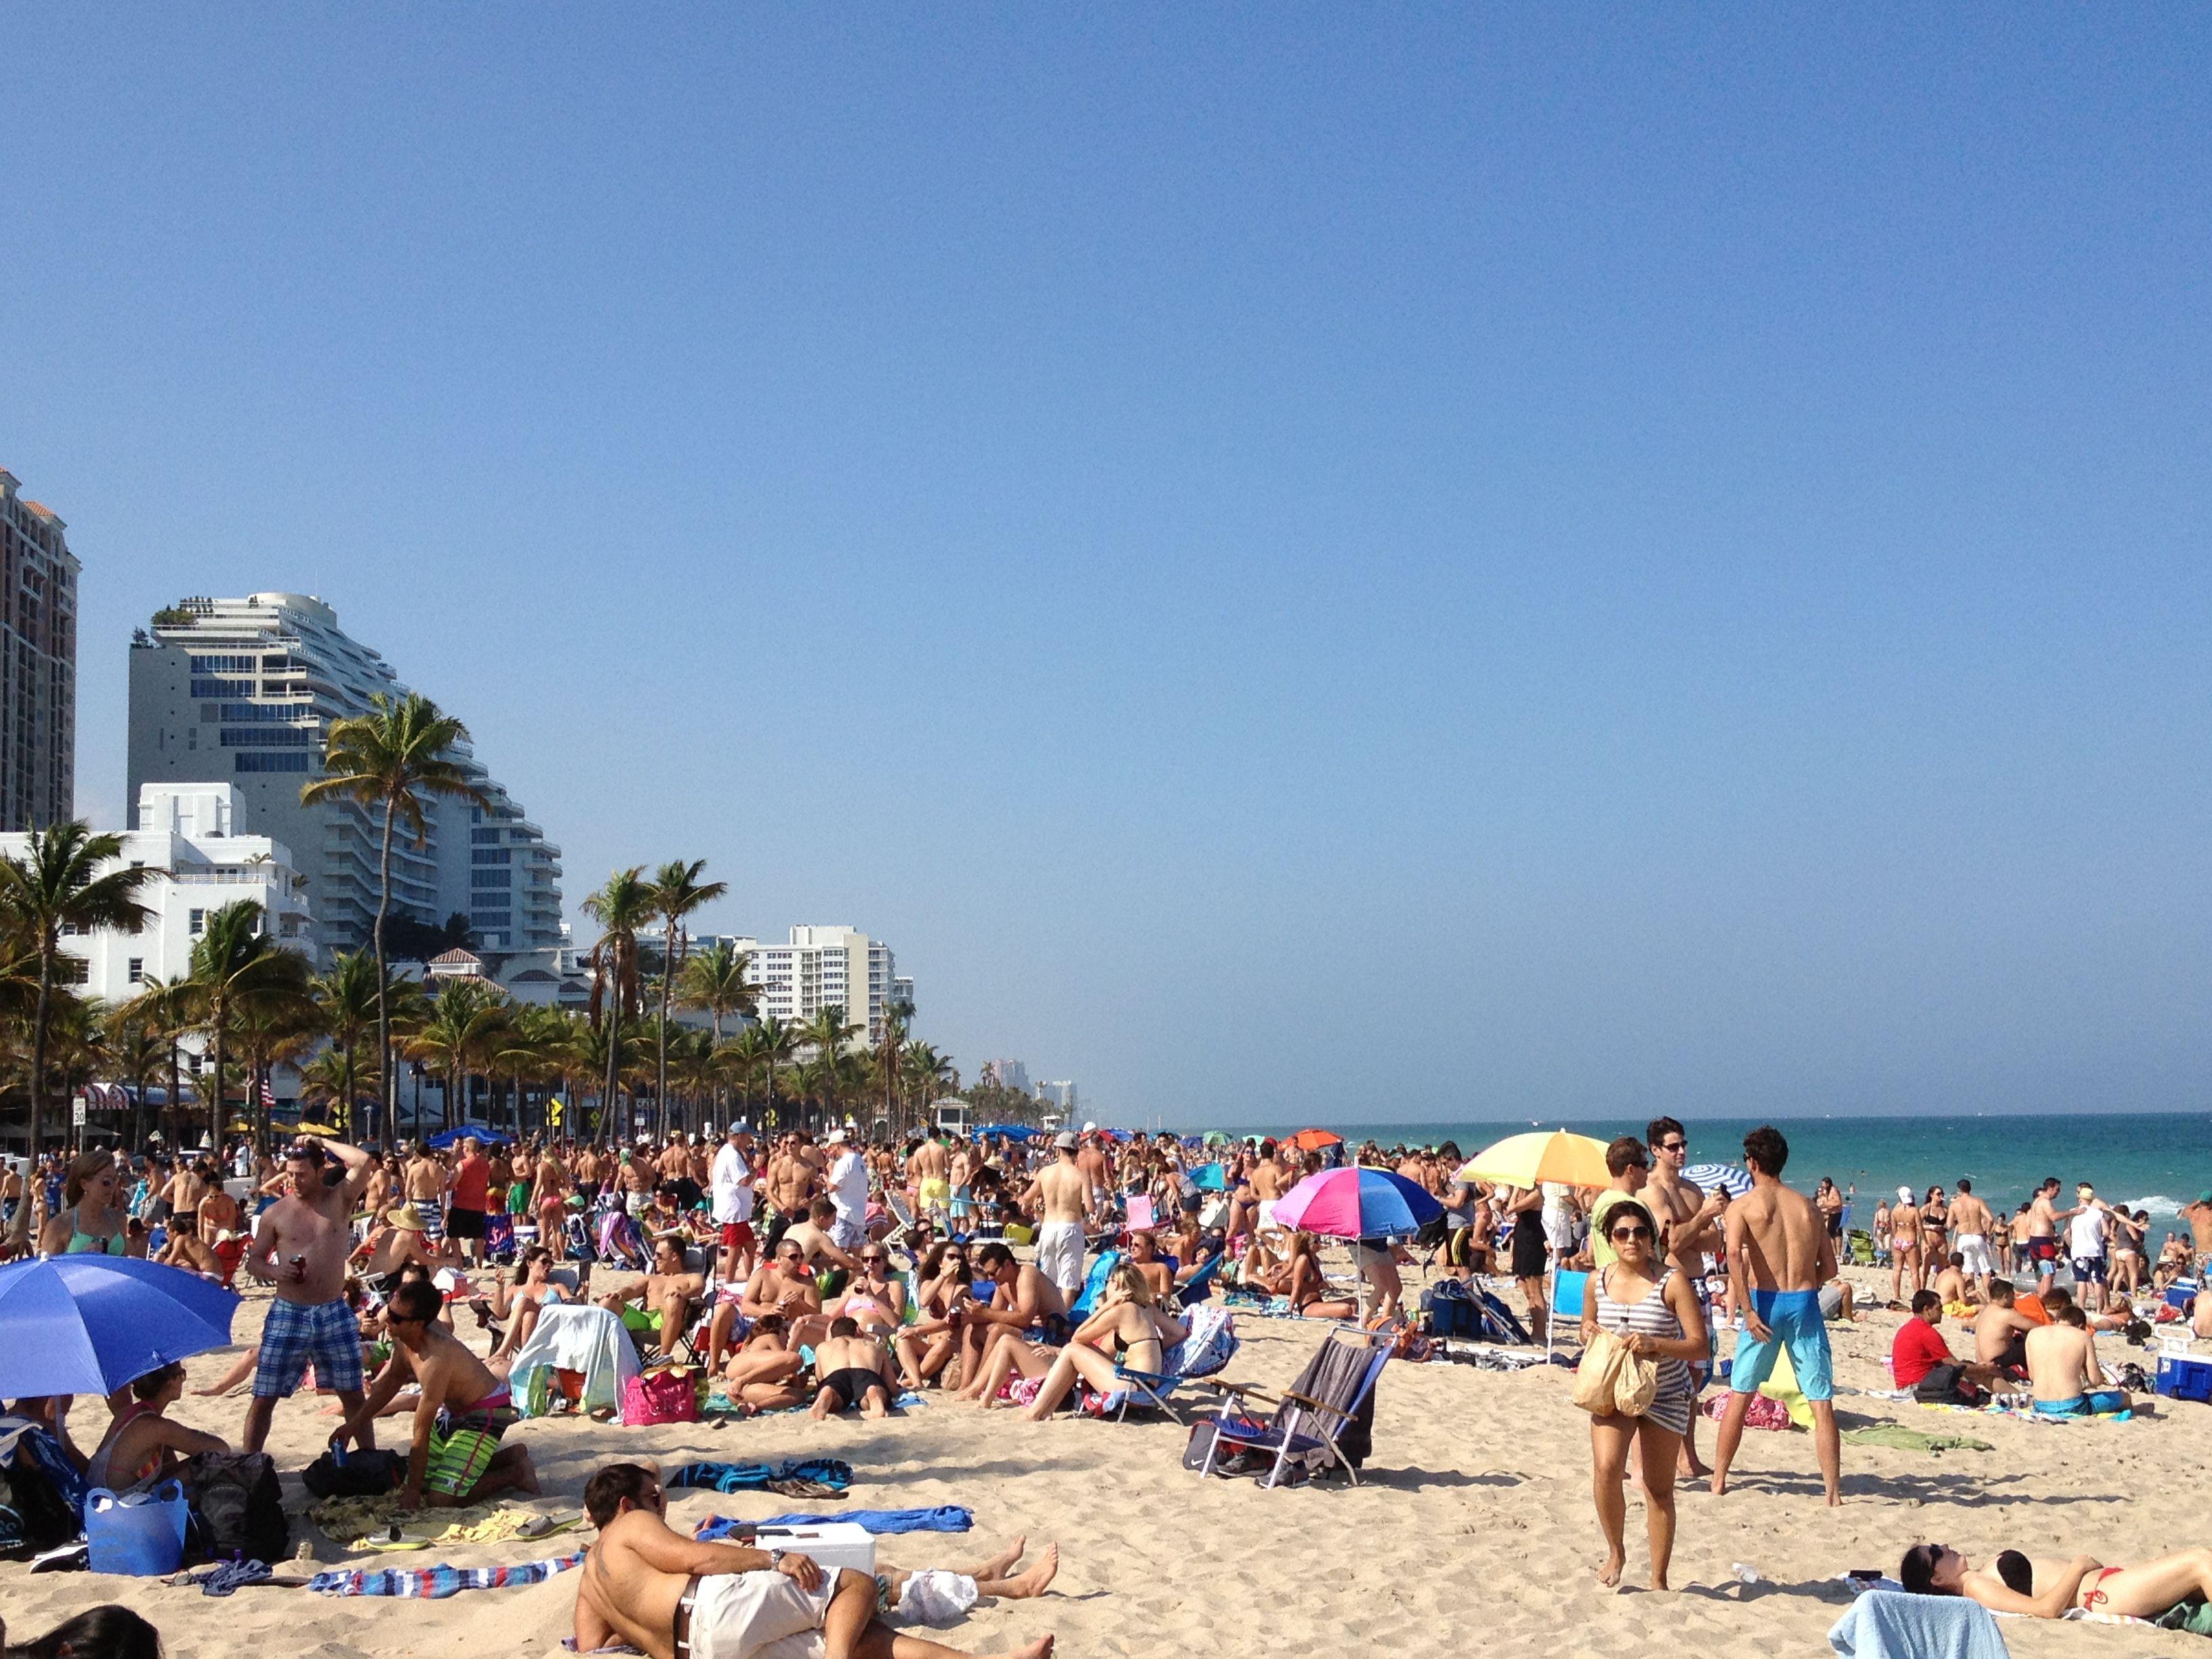 Fort Lauderdale Beach Over Spring Break Florida Spring Break Florida Fort Lauderdale Beach Lauderdale Beach